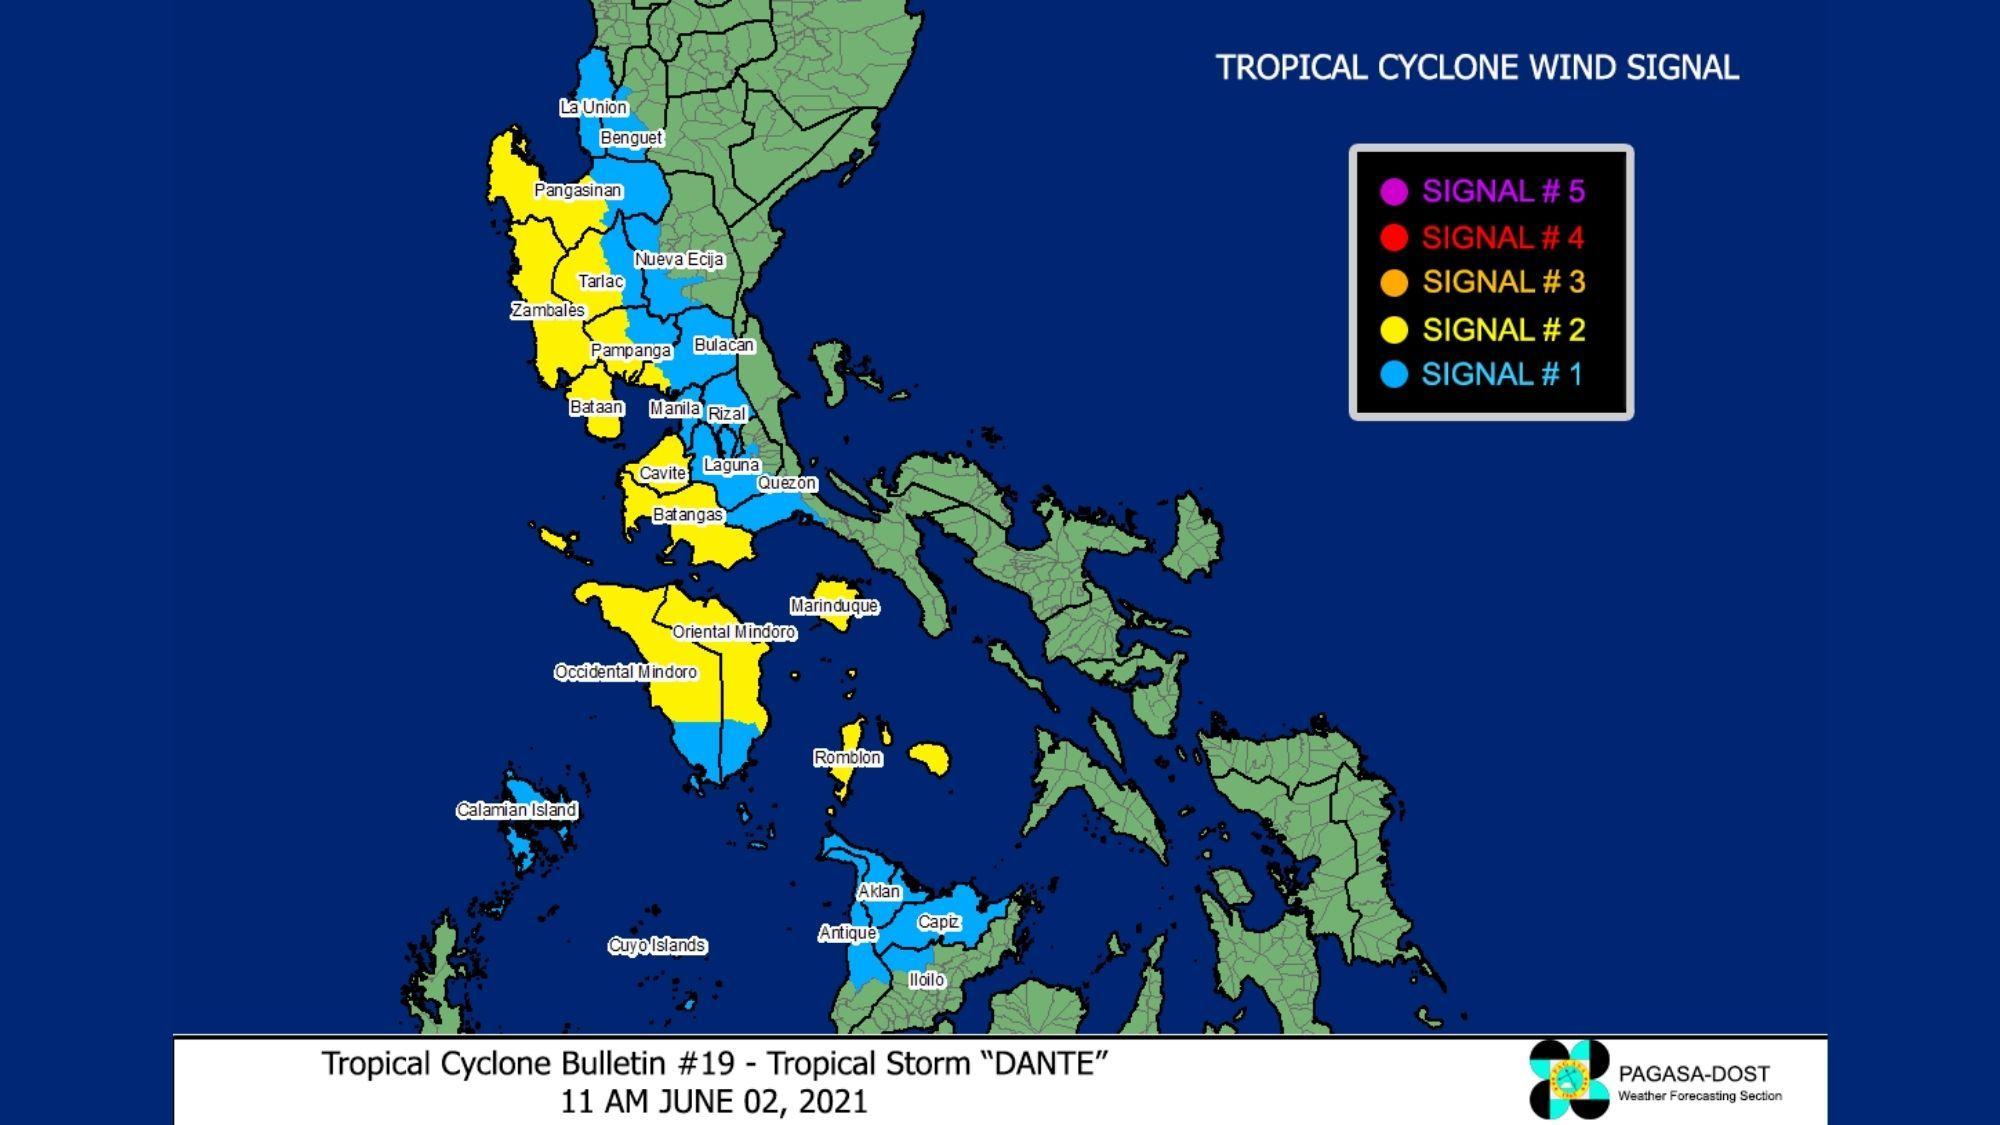 Typhoon Dante As of 11 AM photo